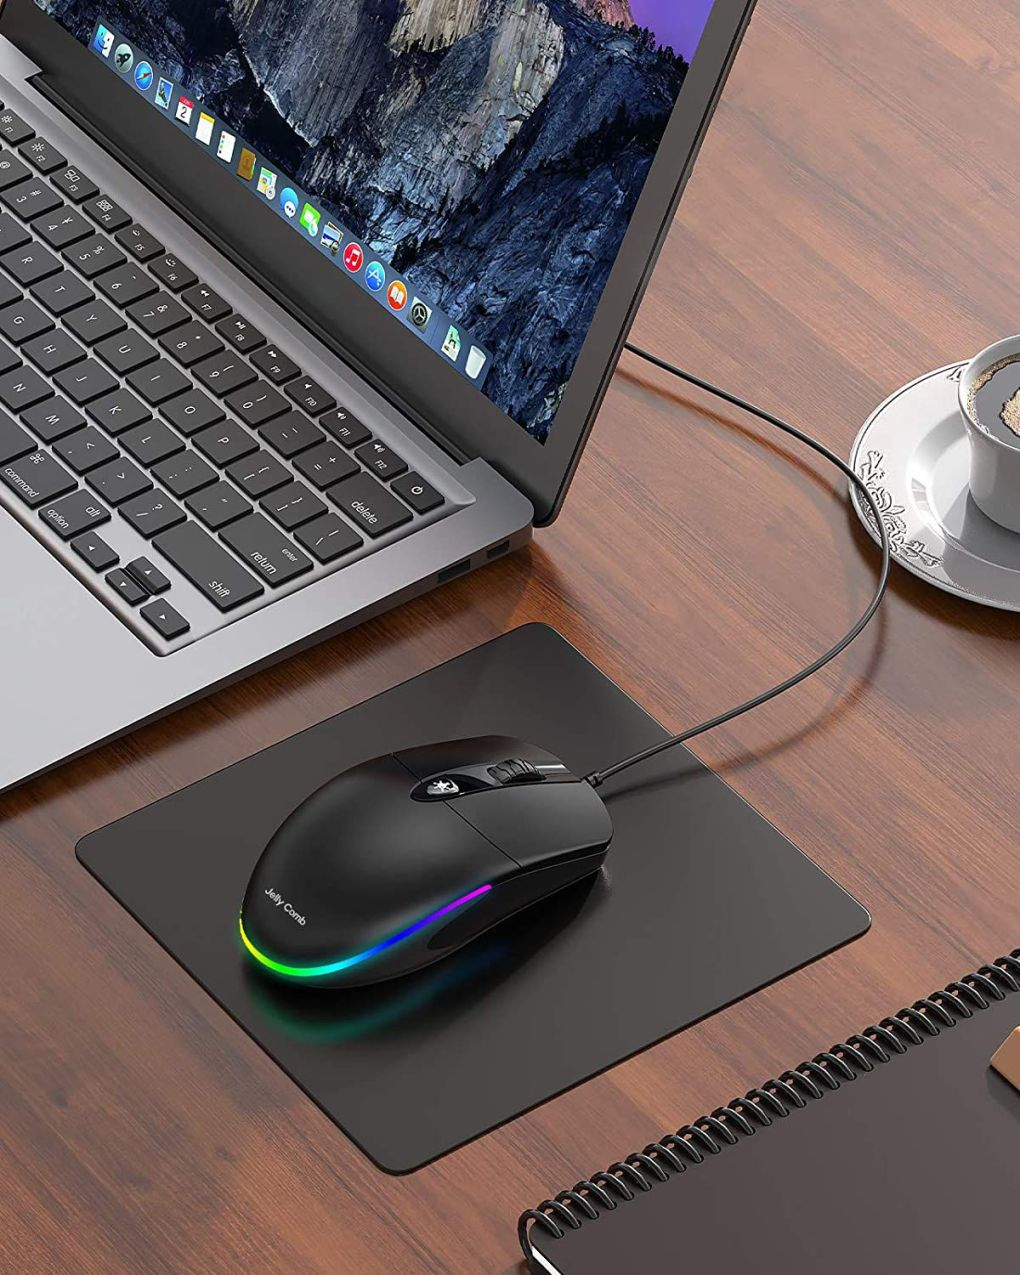 https://www.amazon.com/Microsoft-Arc-Mouse-ELG-00001-Black/dp/B072FG8LBV